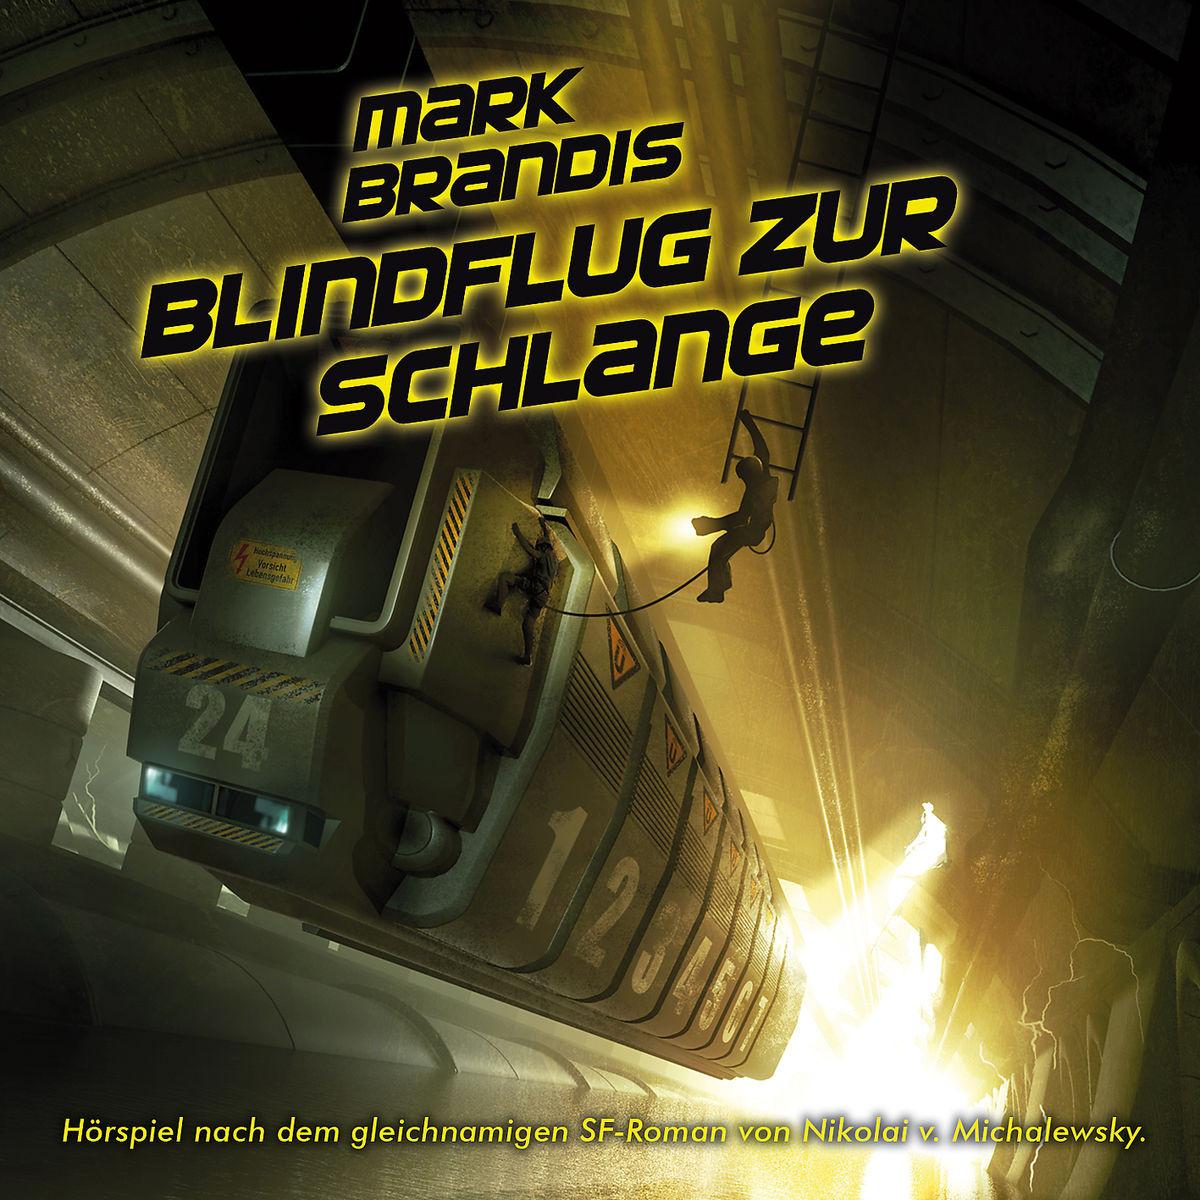 Mark Brandis - 24 - Blindflug zur Schlange